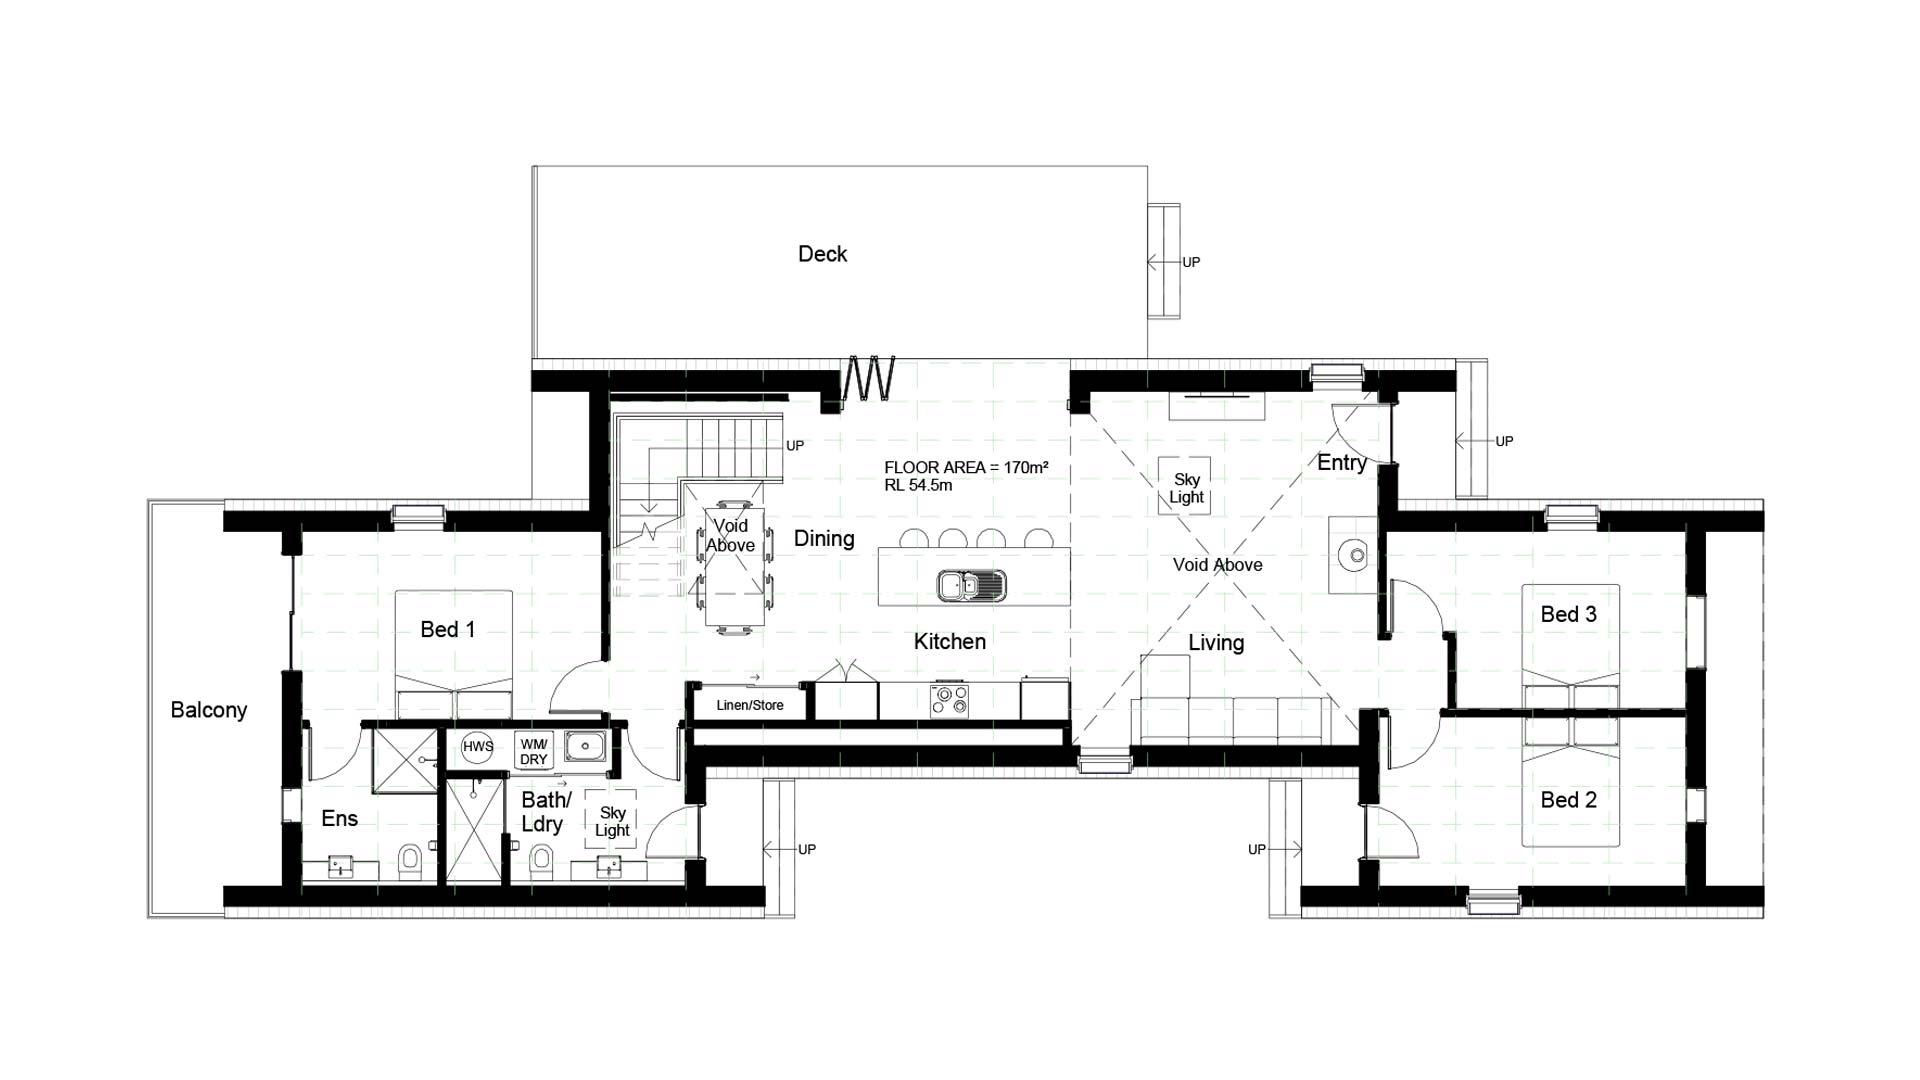 energy efficient home floorplan